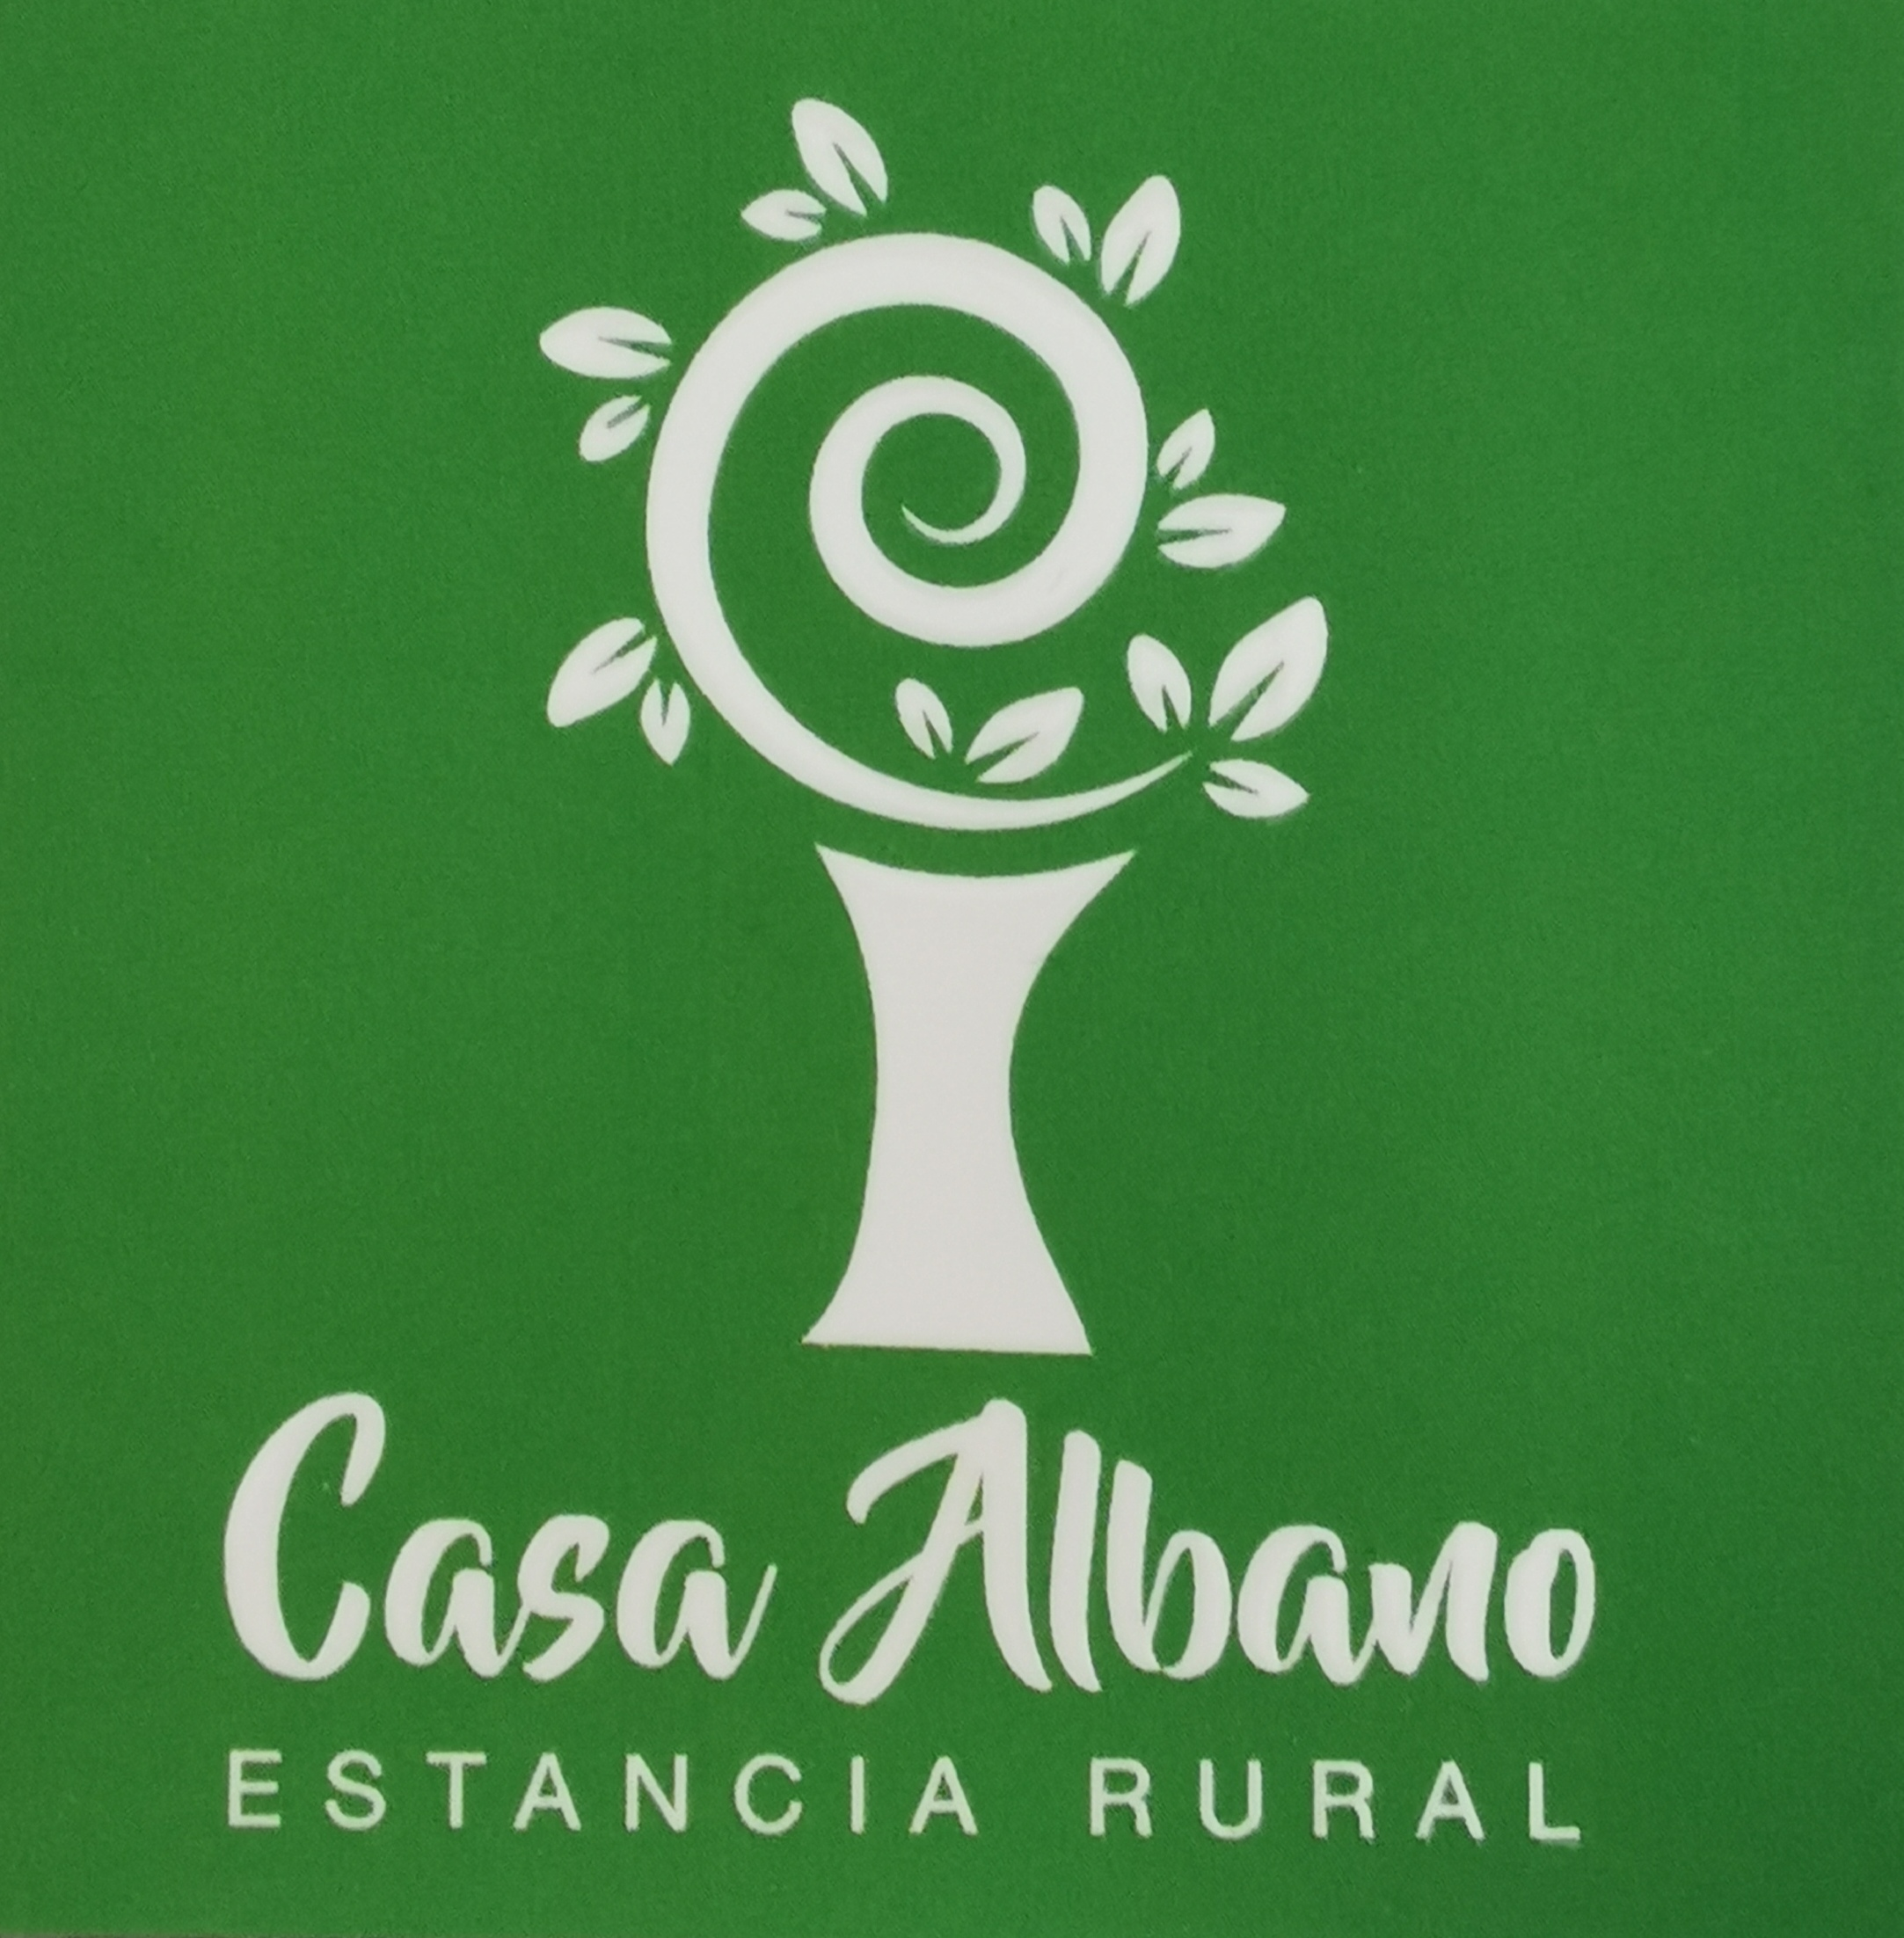 Casa Rural Albano